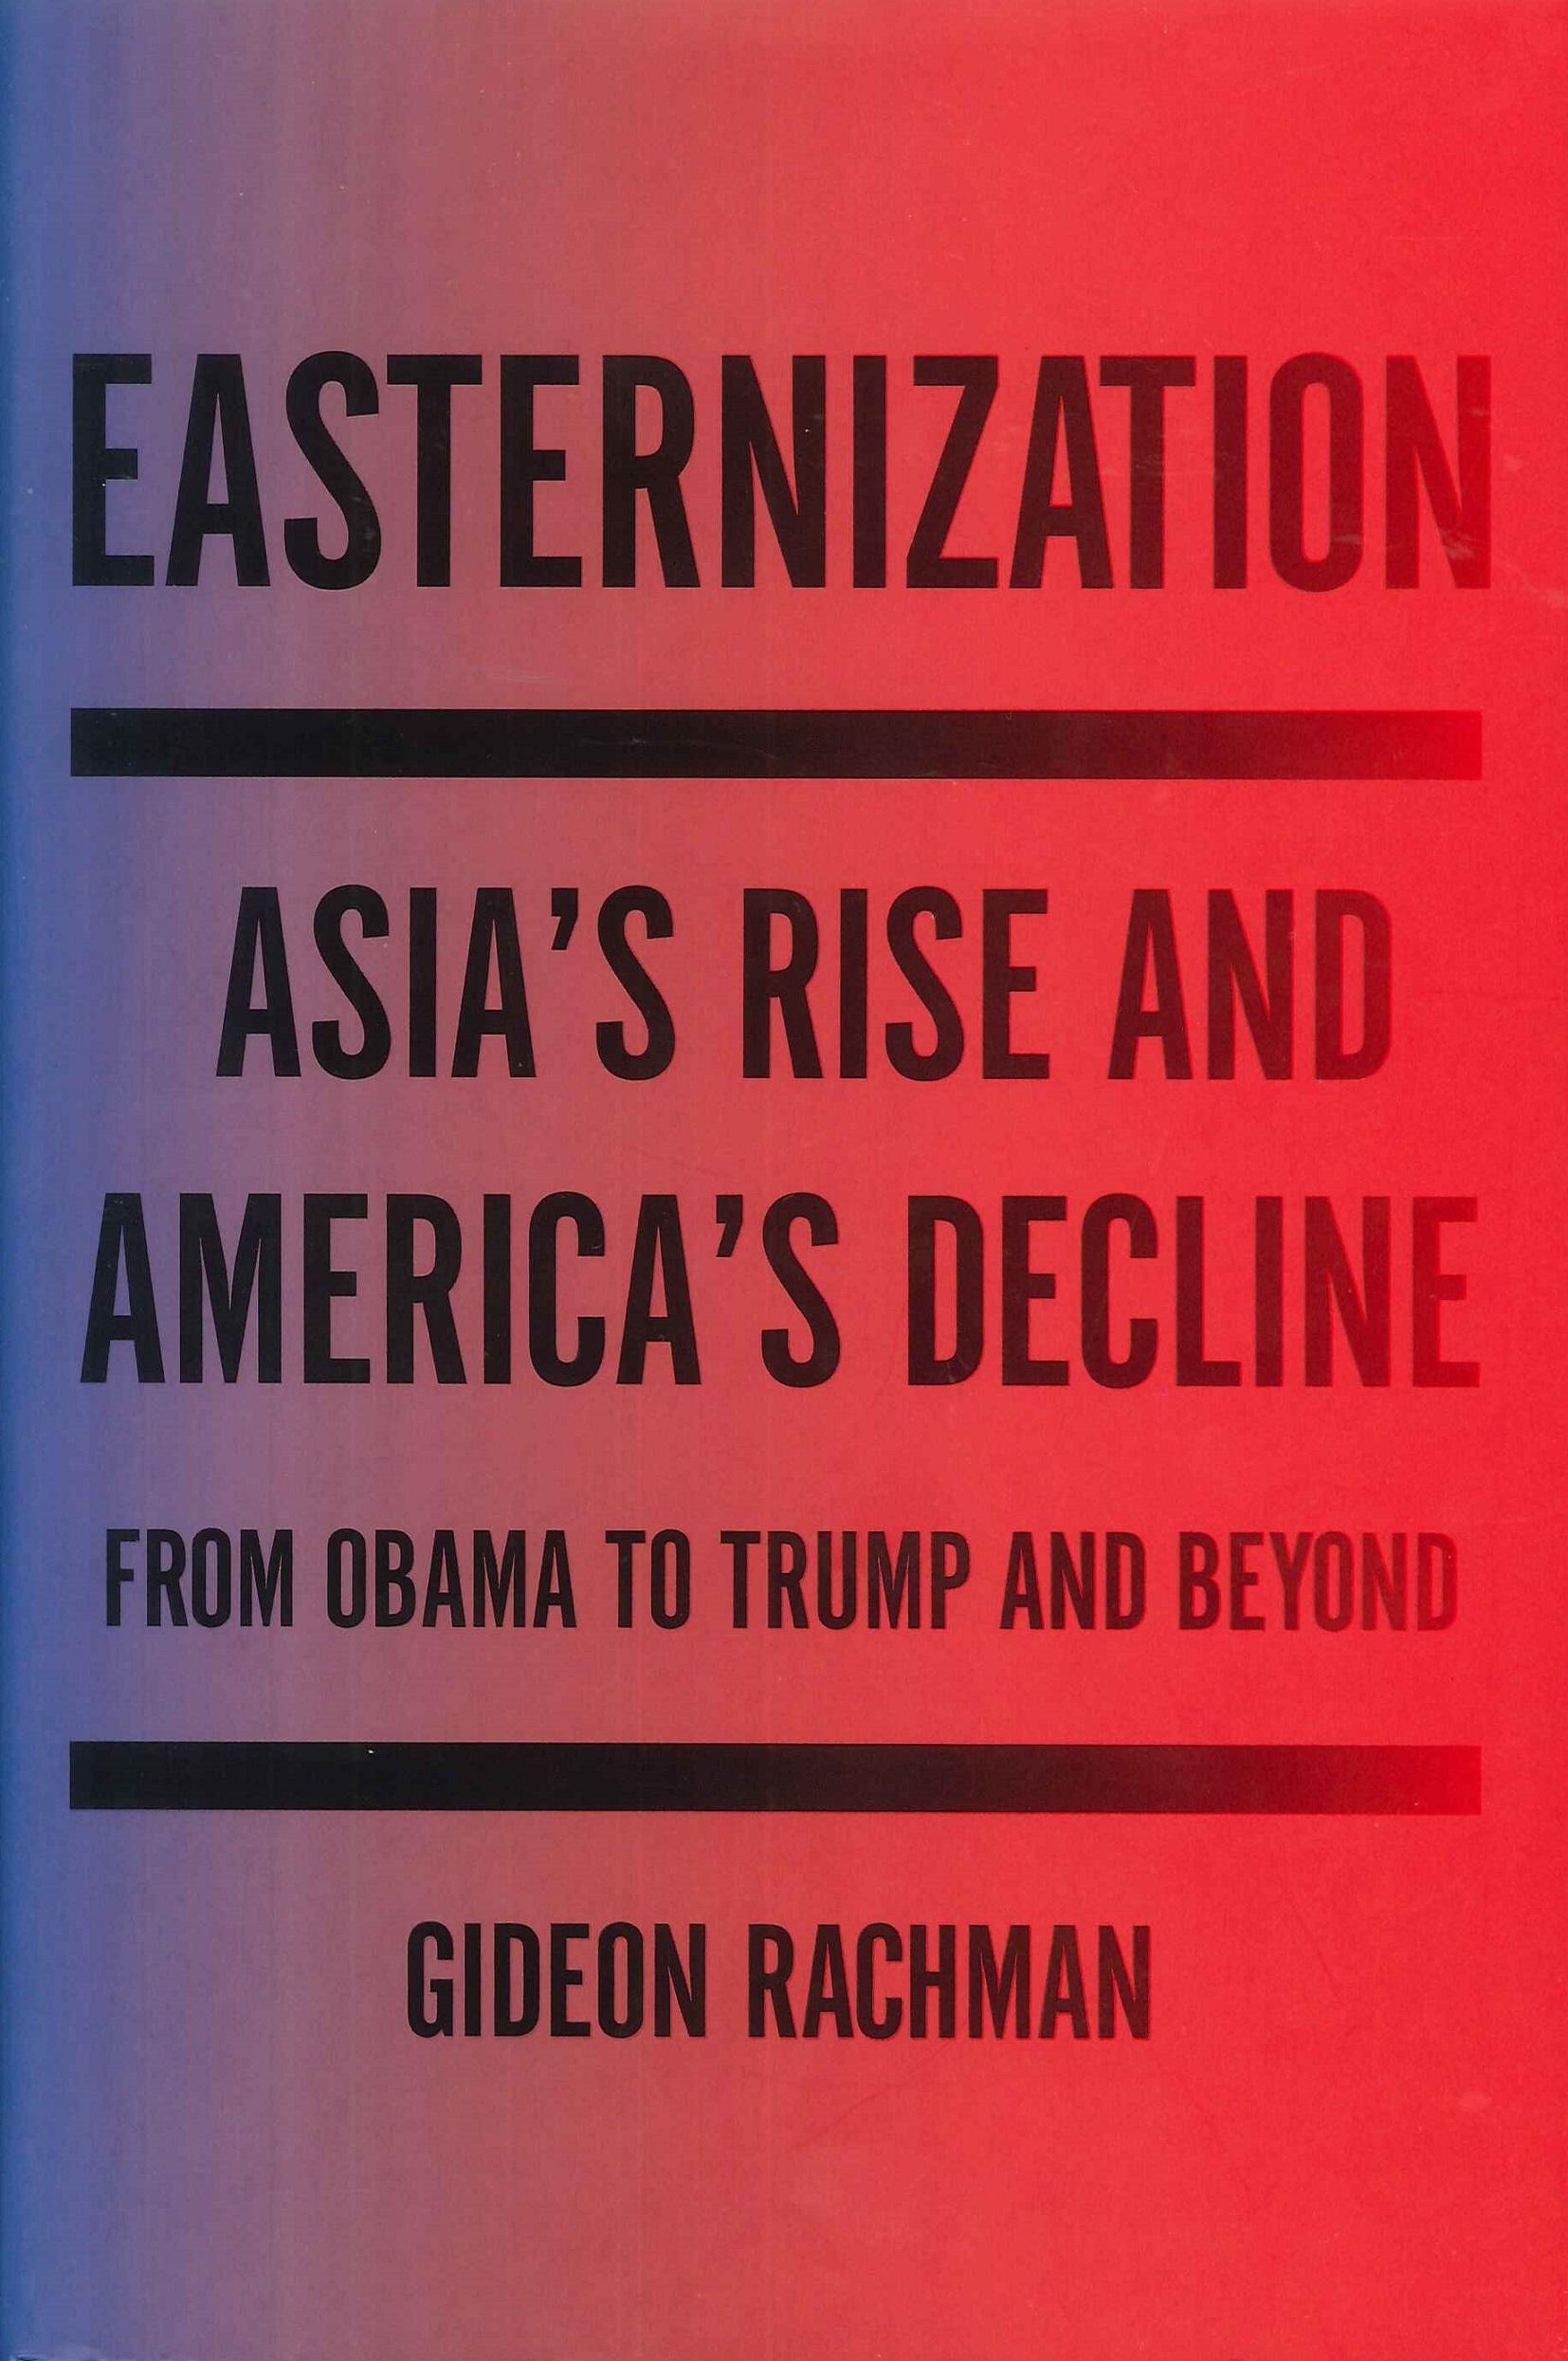 Easternization:Asia